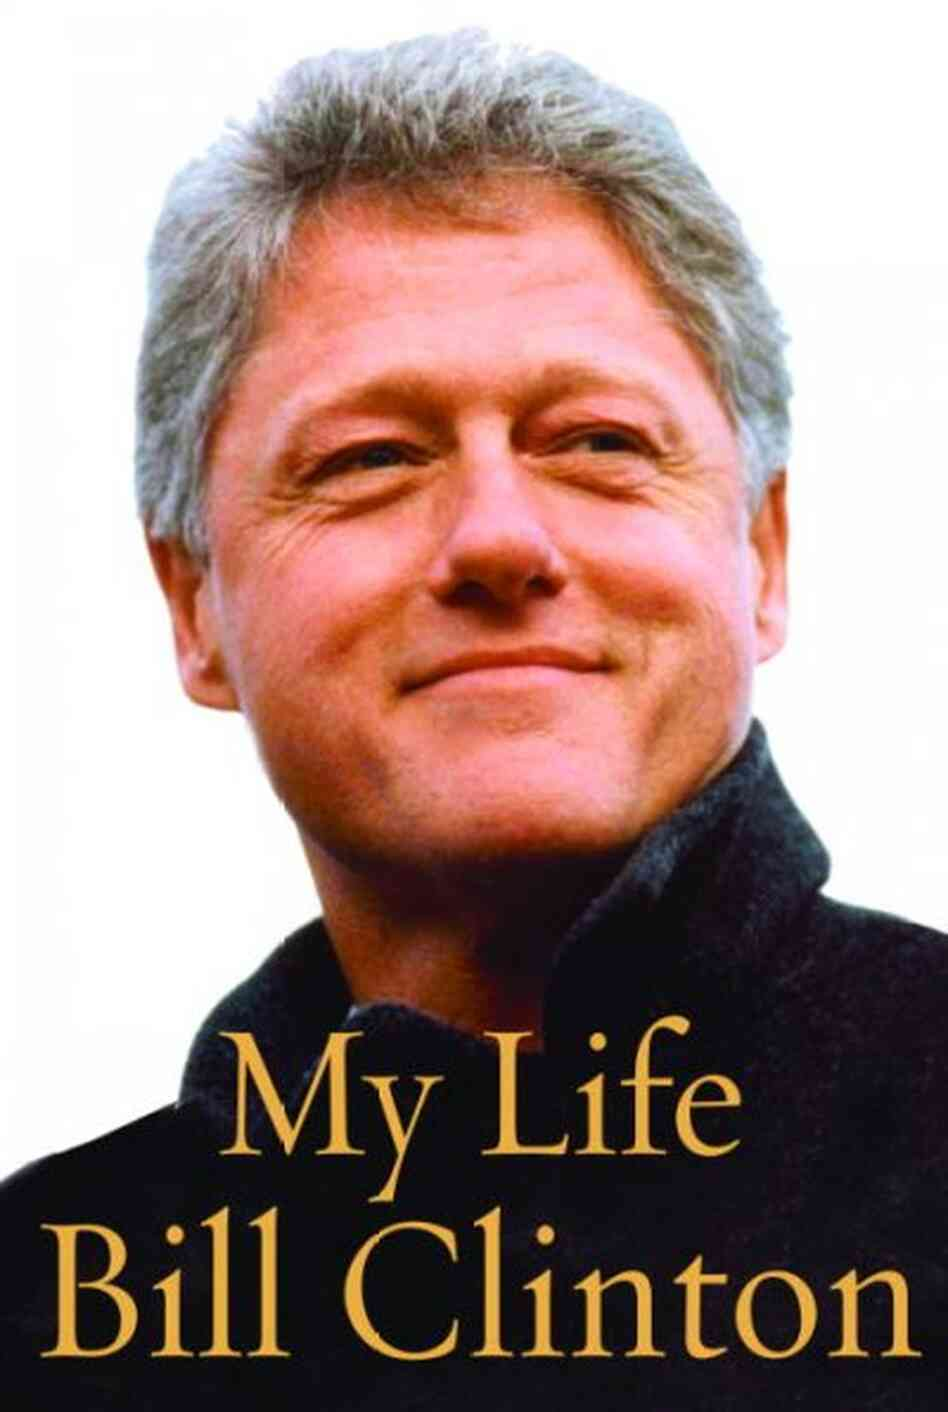 Bill Clinton On Life After The Presidency Npr